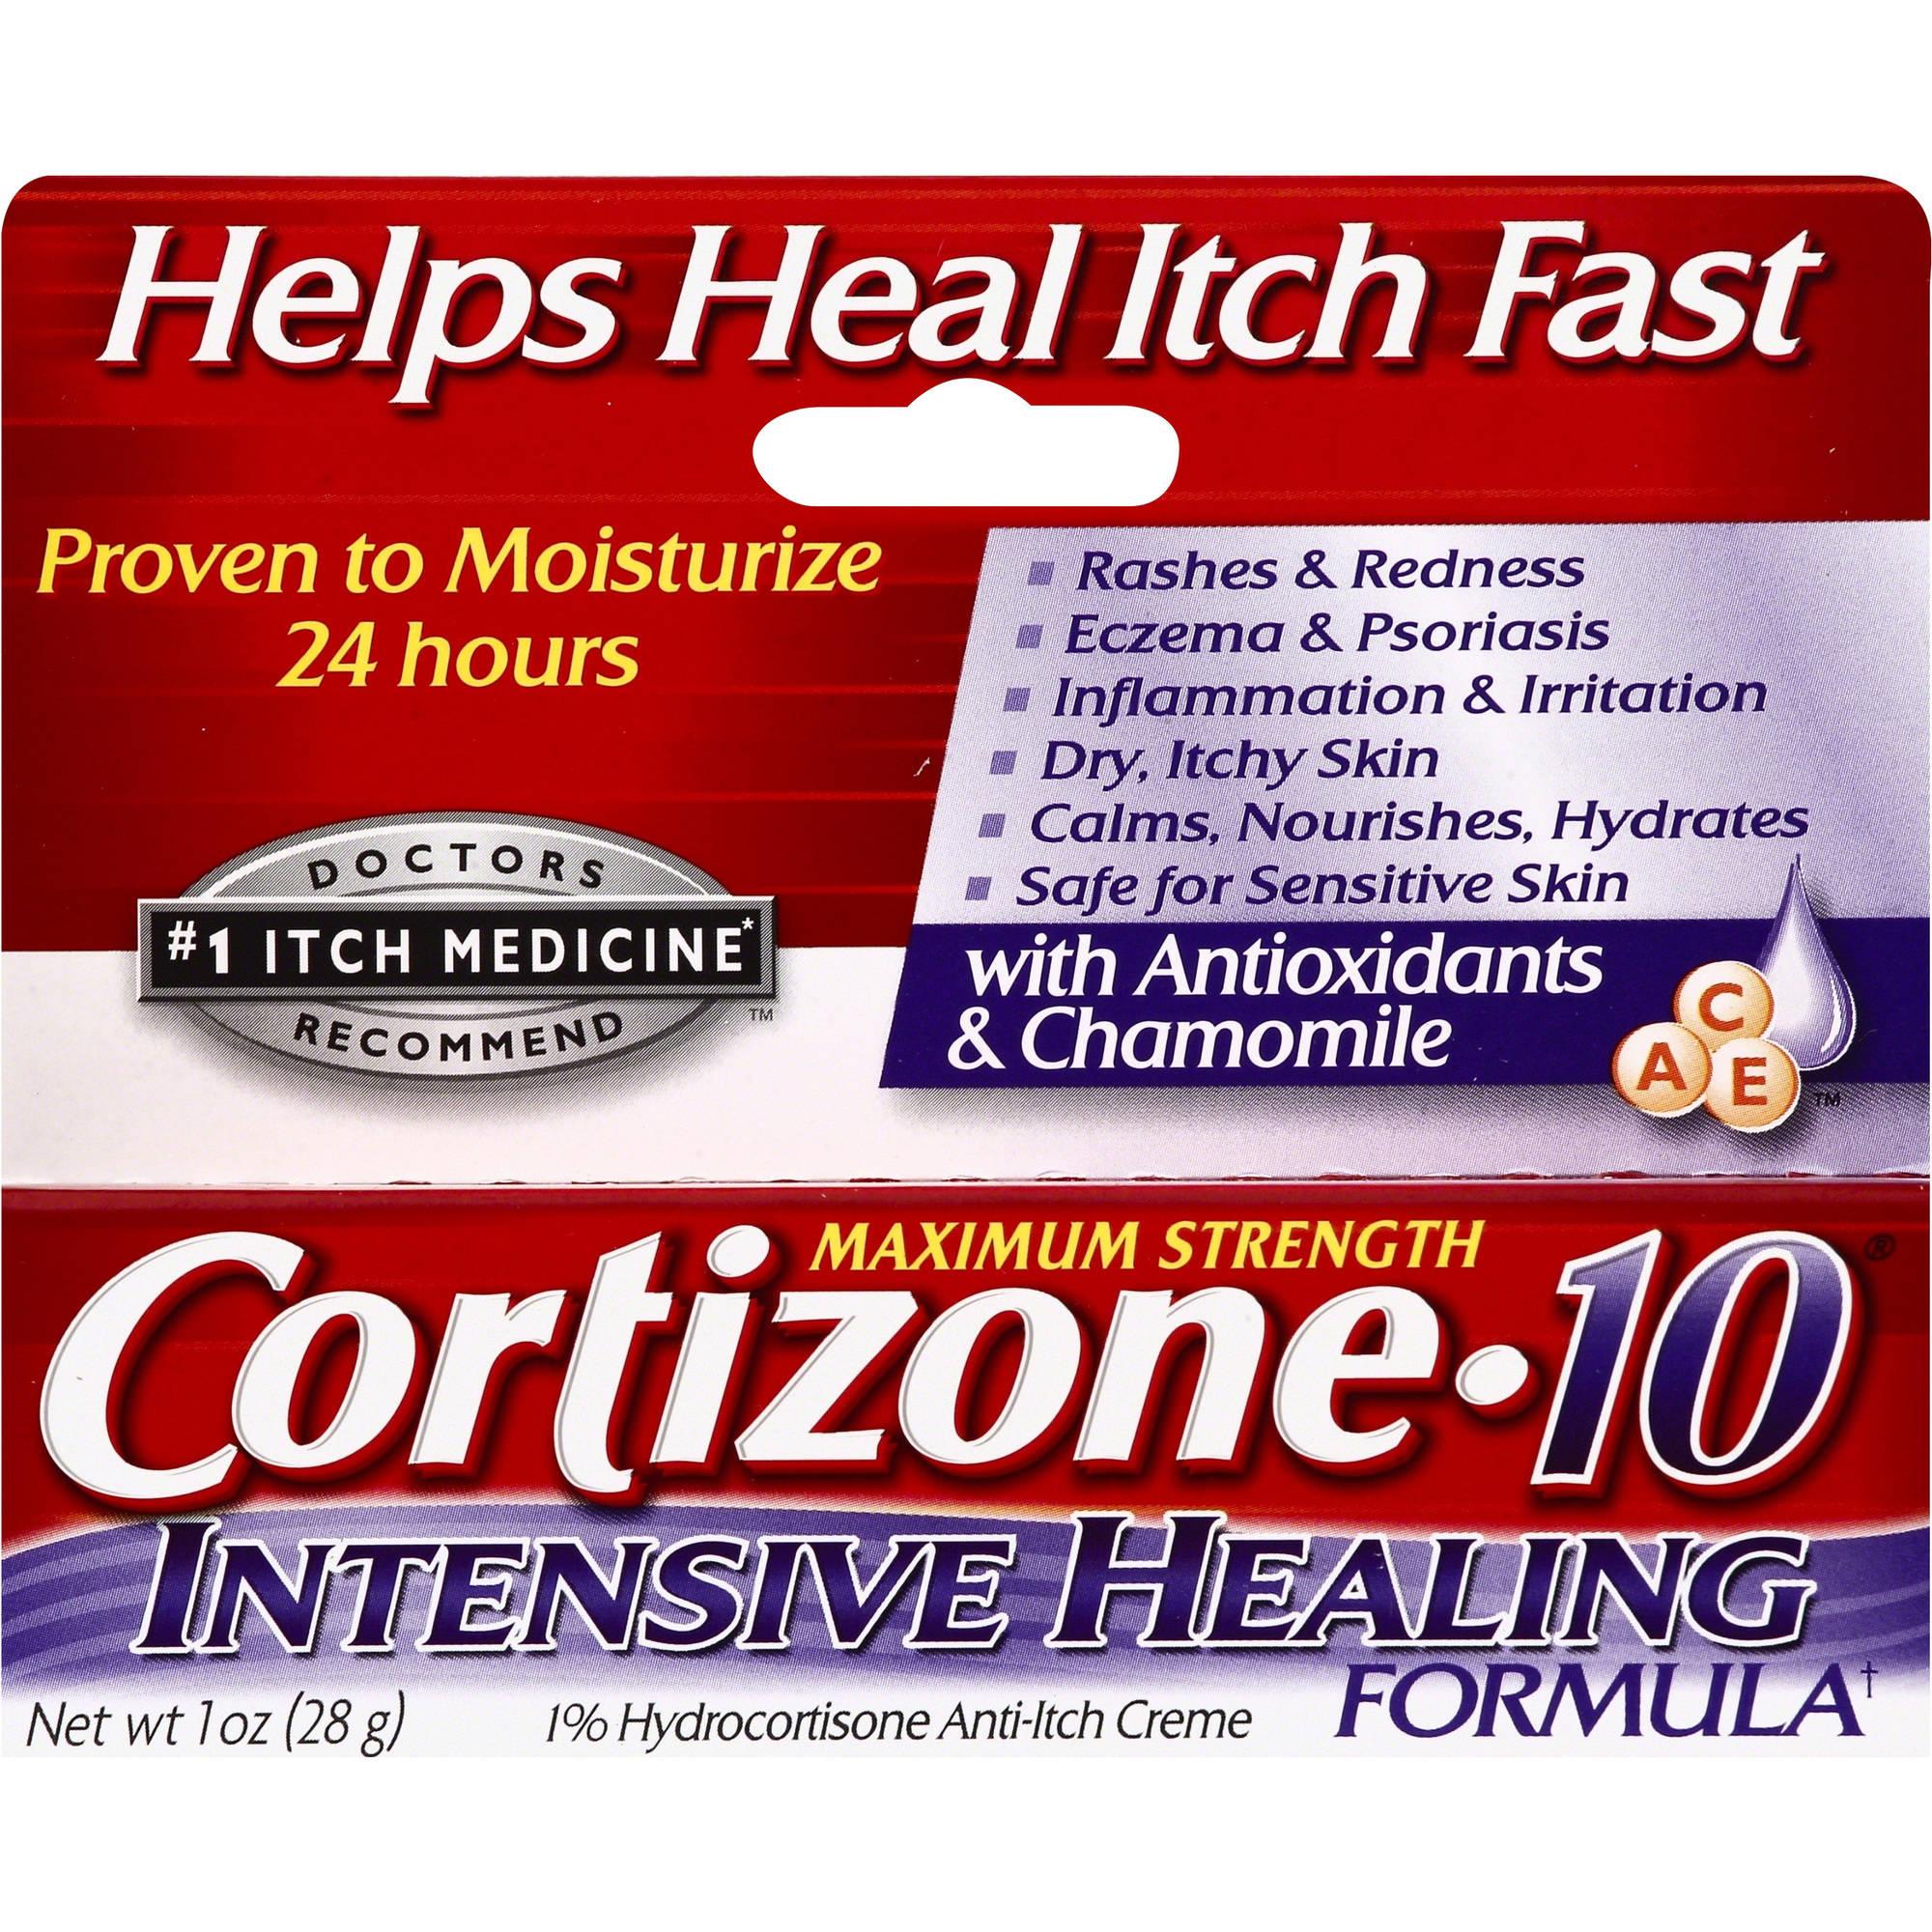 Cortizone Maximum Strength Intensive Healing Formula Creme, 1oz